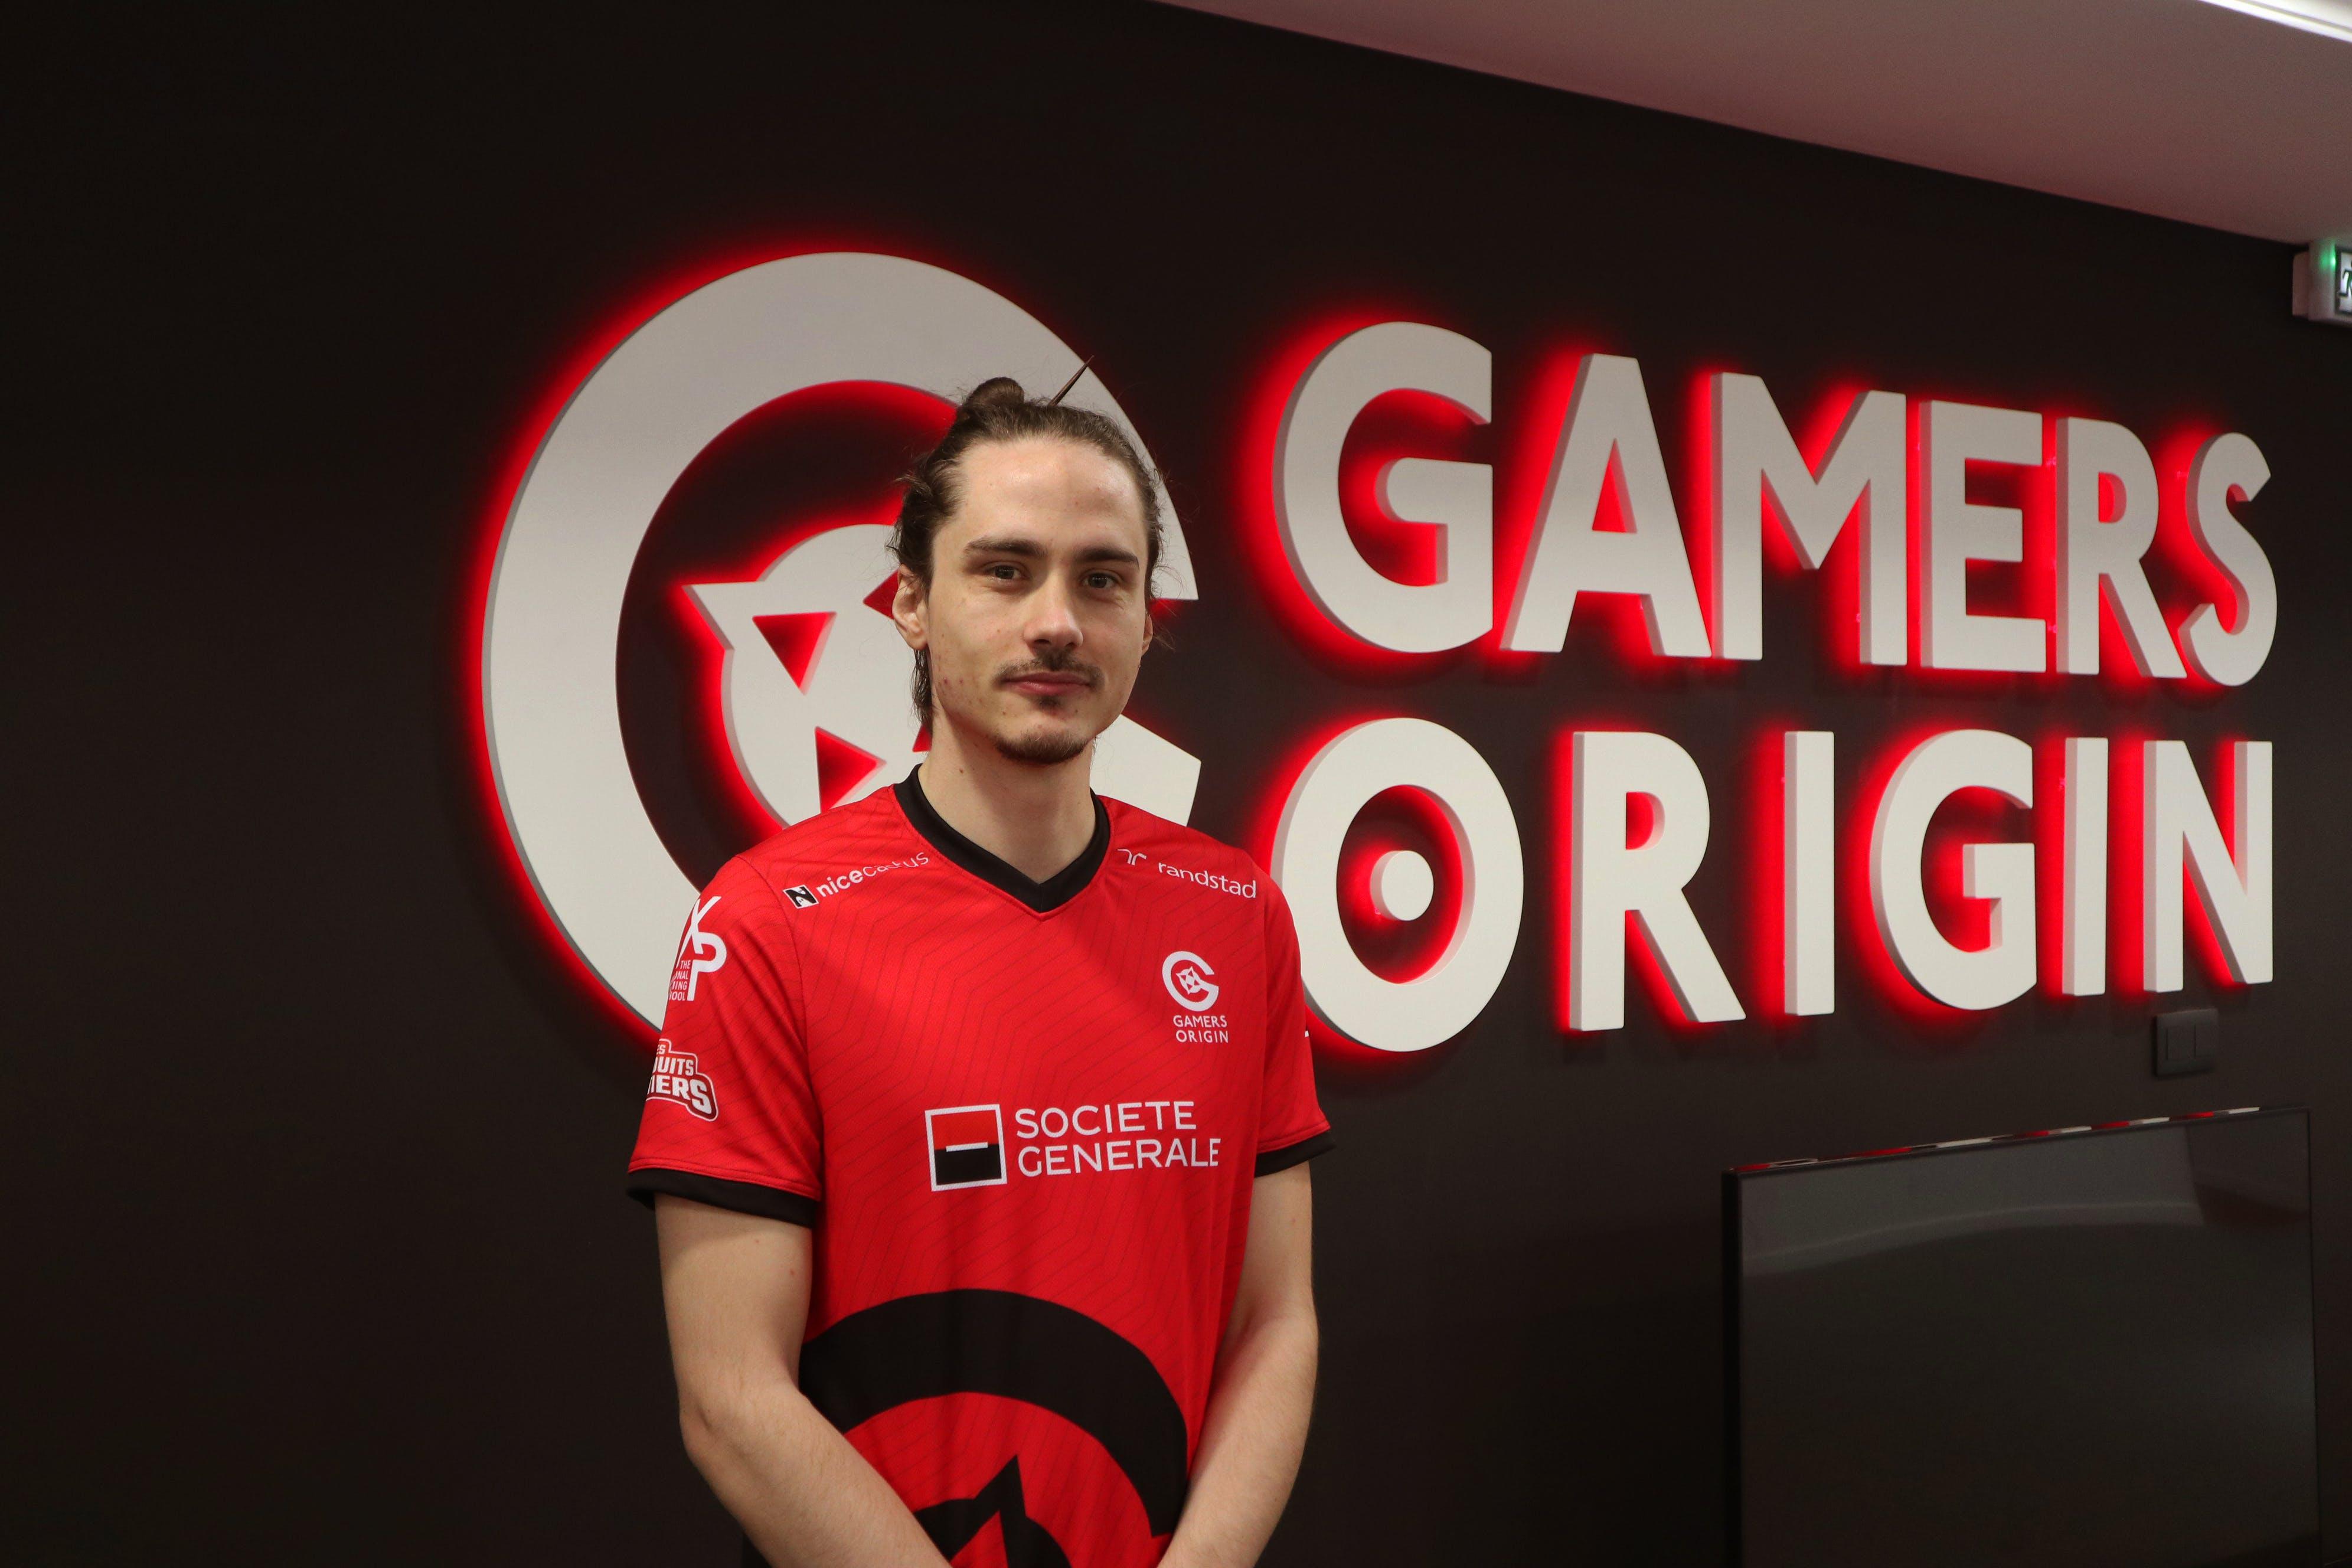 Gloponus rejoint GamersOrigin Academy en tant que coach (Crédits photo: GamersOrigin)